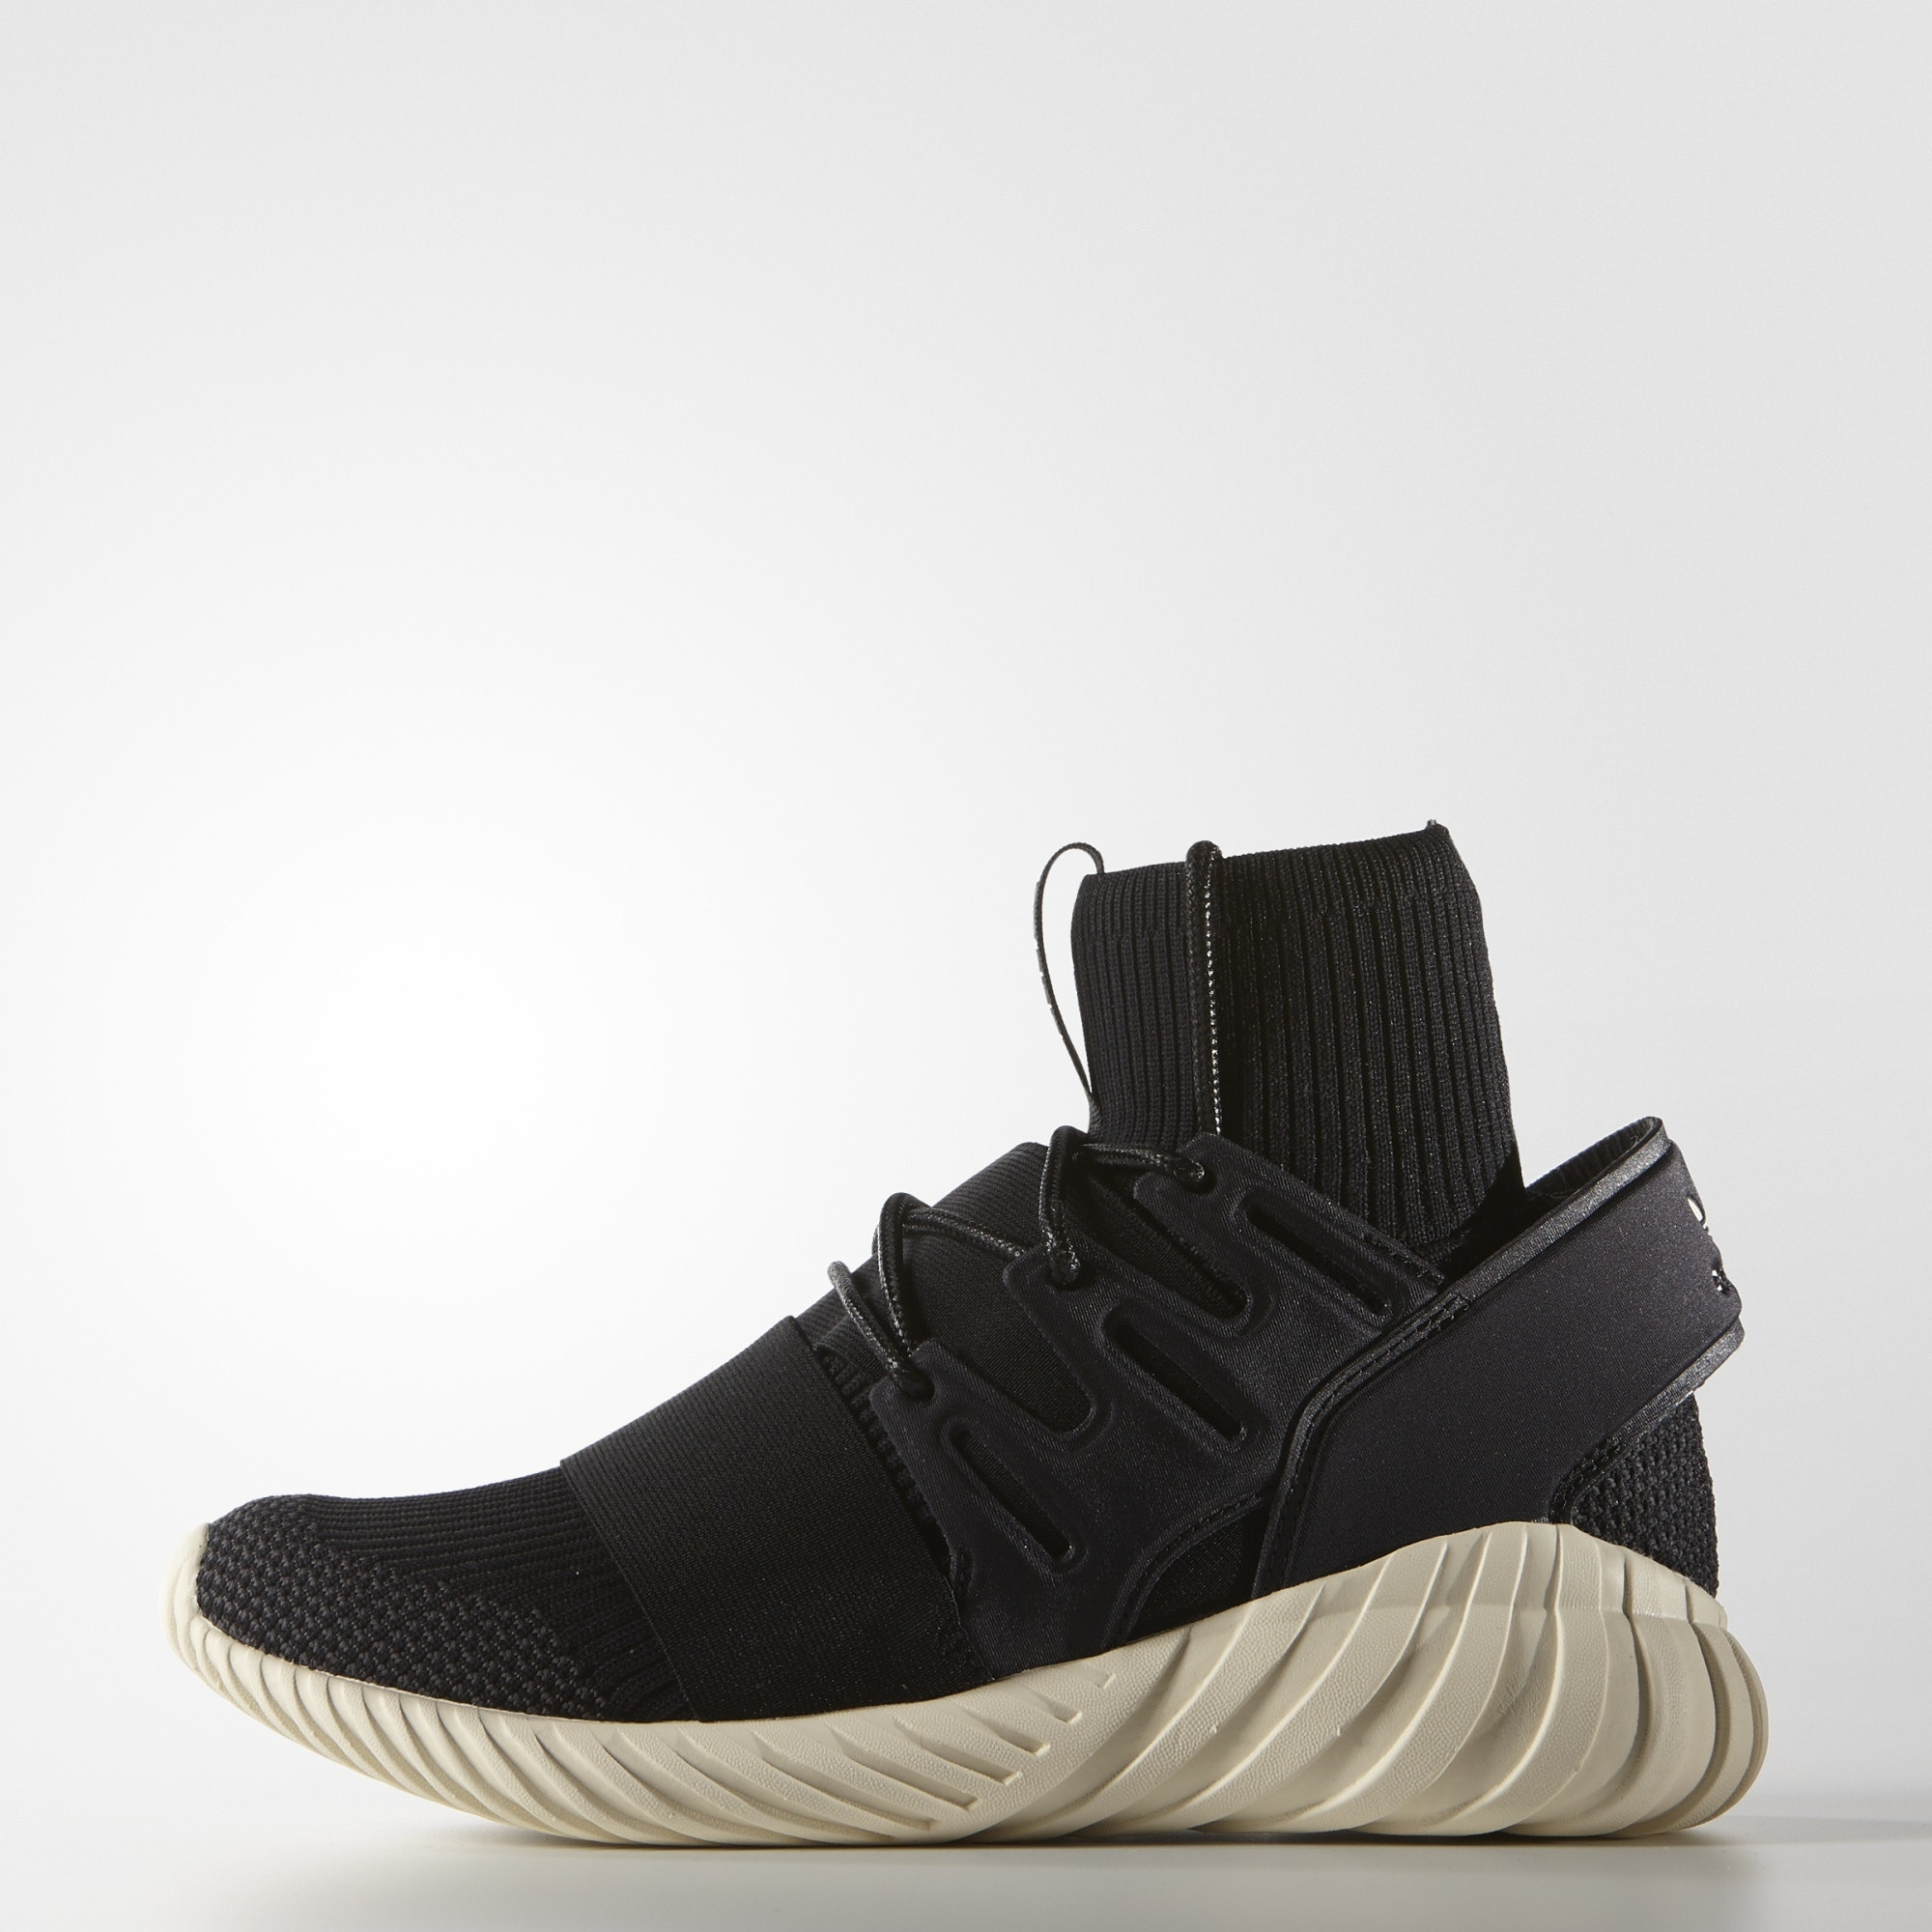 adidas Tubular Doom Primeknit Shoes - Black | adidas US